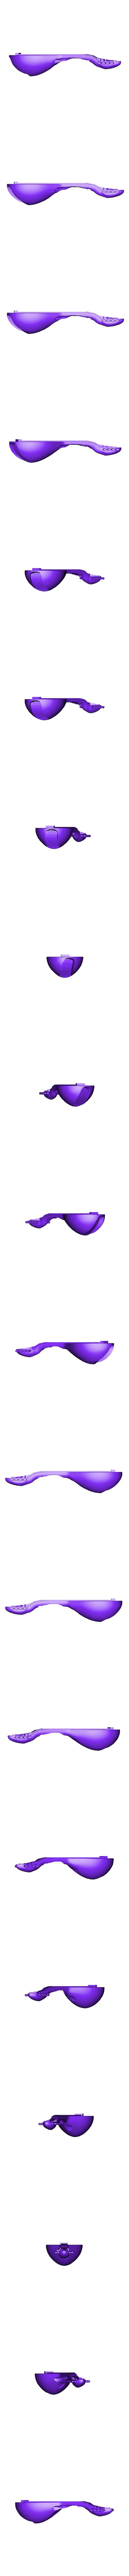 Dob_Lute.stl Download free STL file Dob • 3D printing object, asininedave